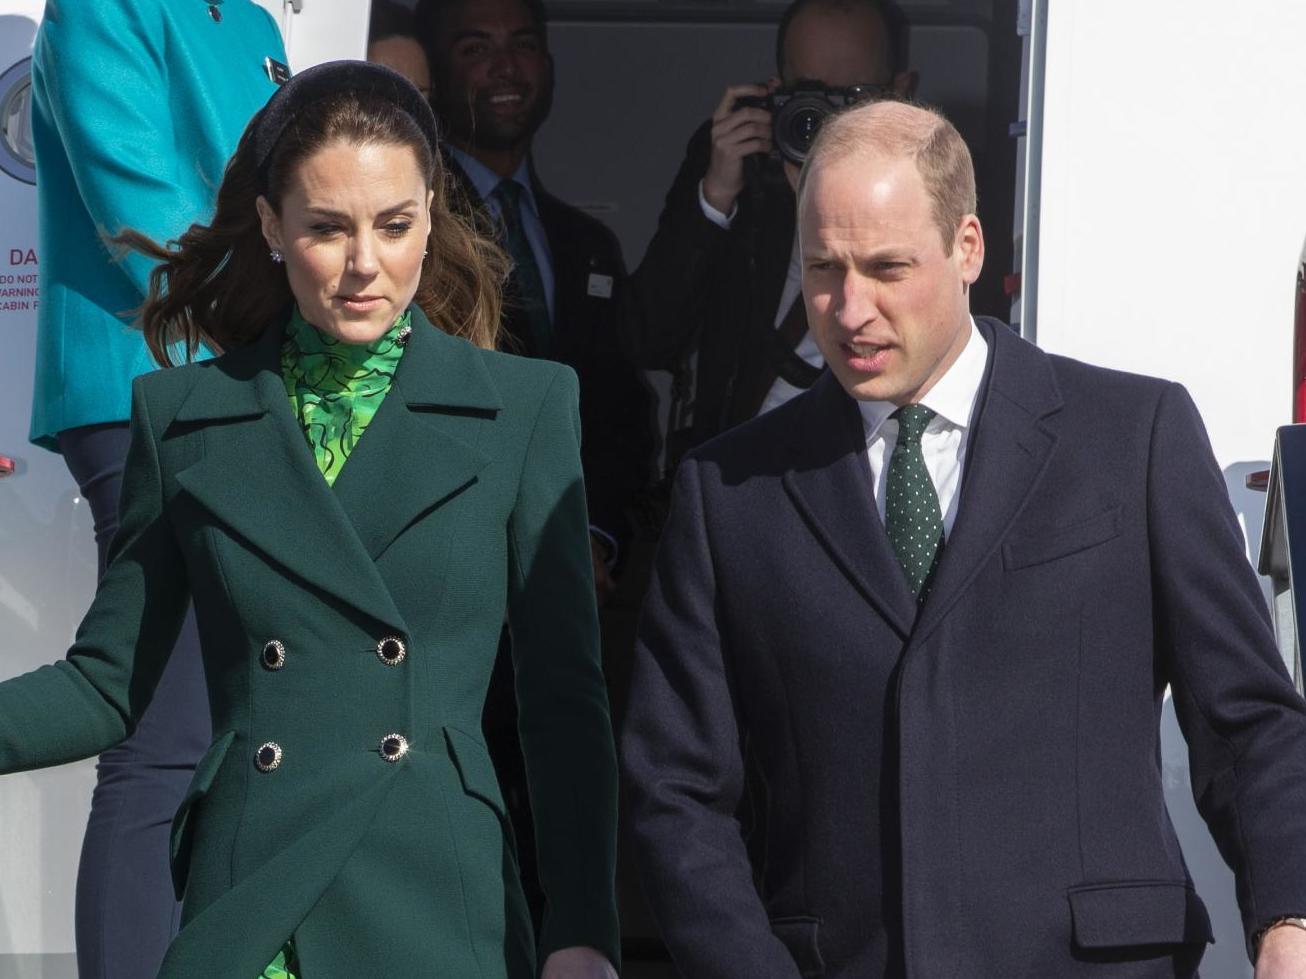 Coronavirus: Prince William jokes about 'spreading' Covid-19 during Ireland tour